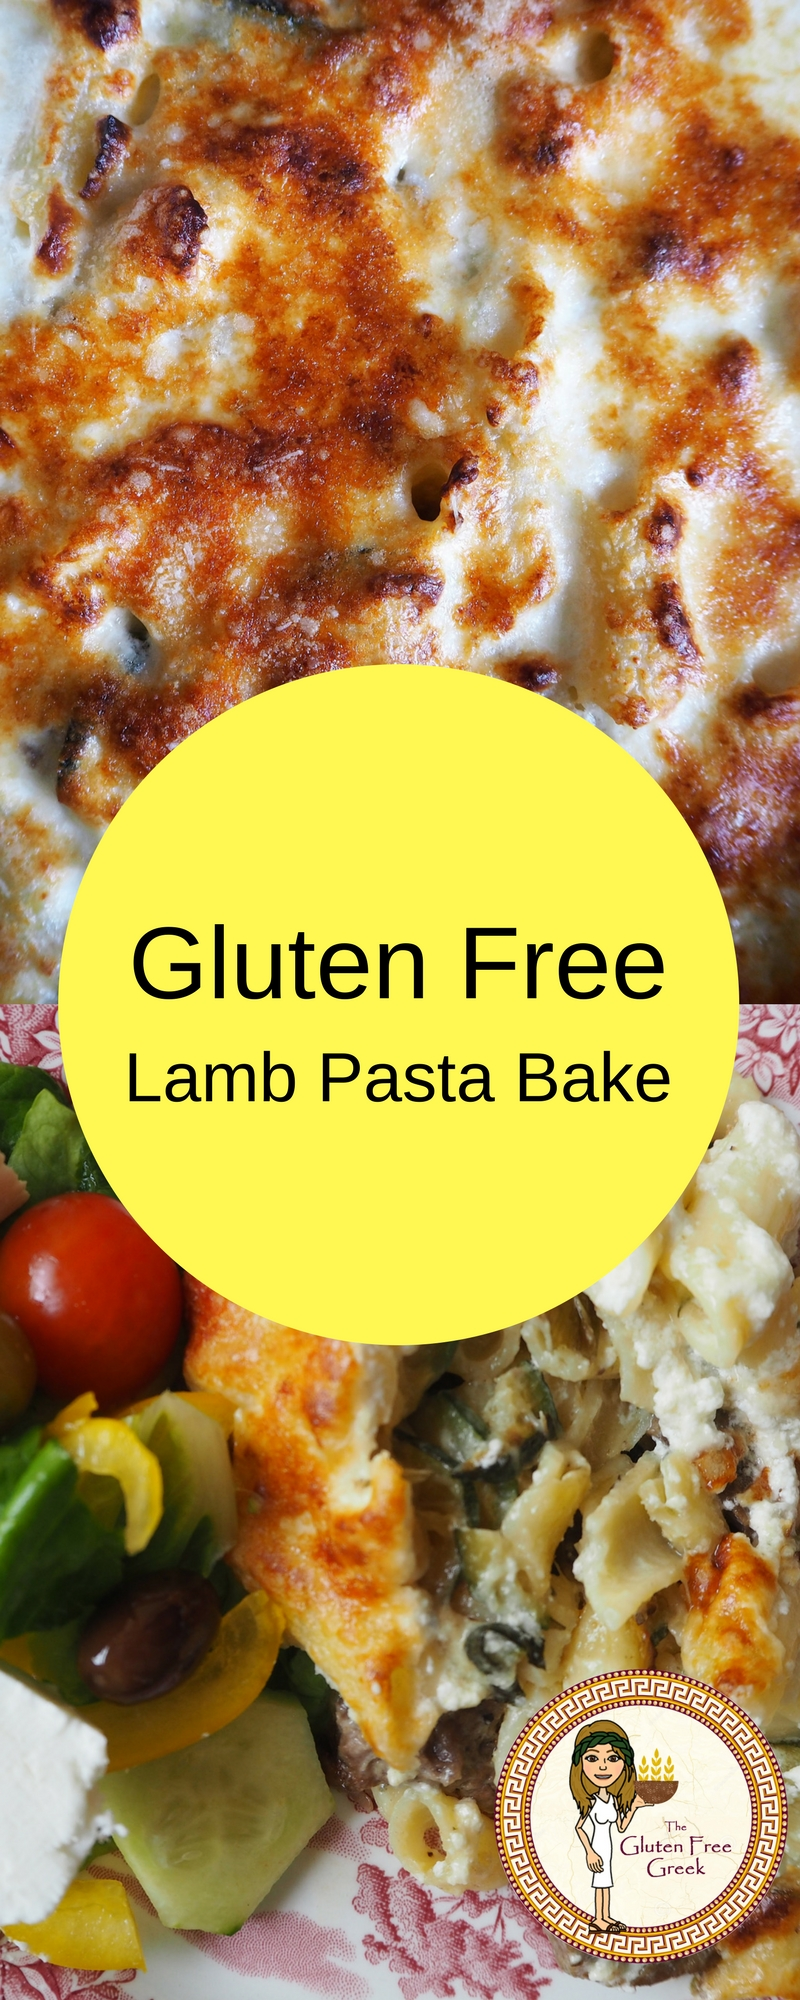 gluten free lamb pasta bake pinterest